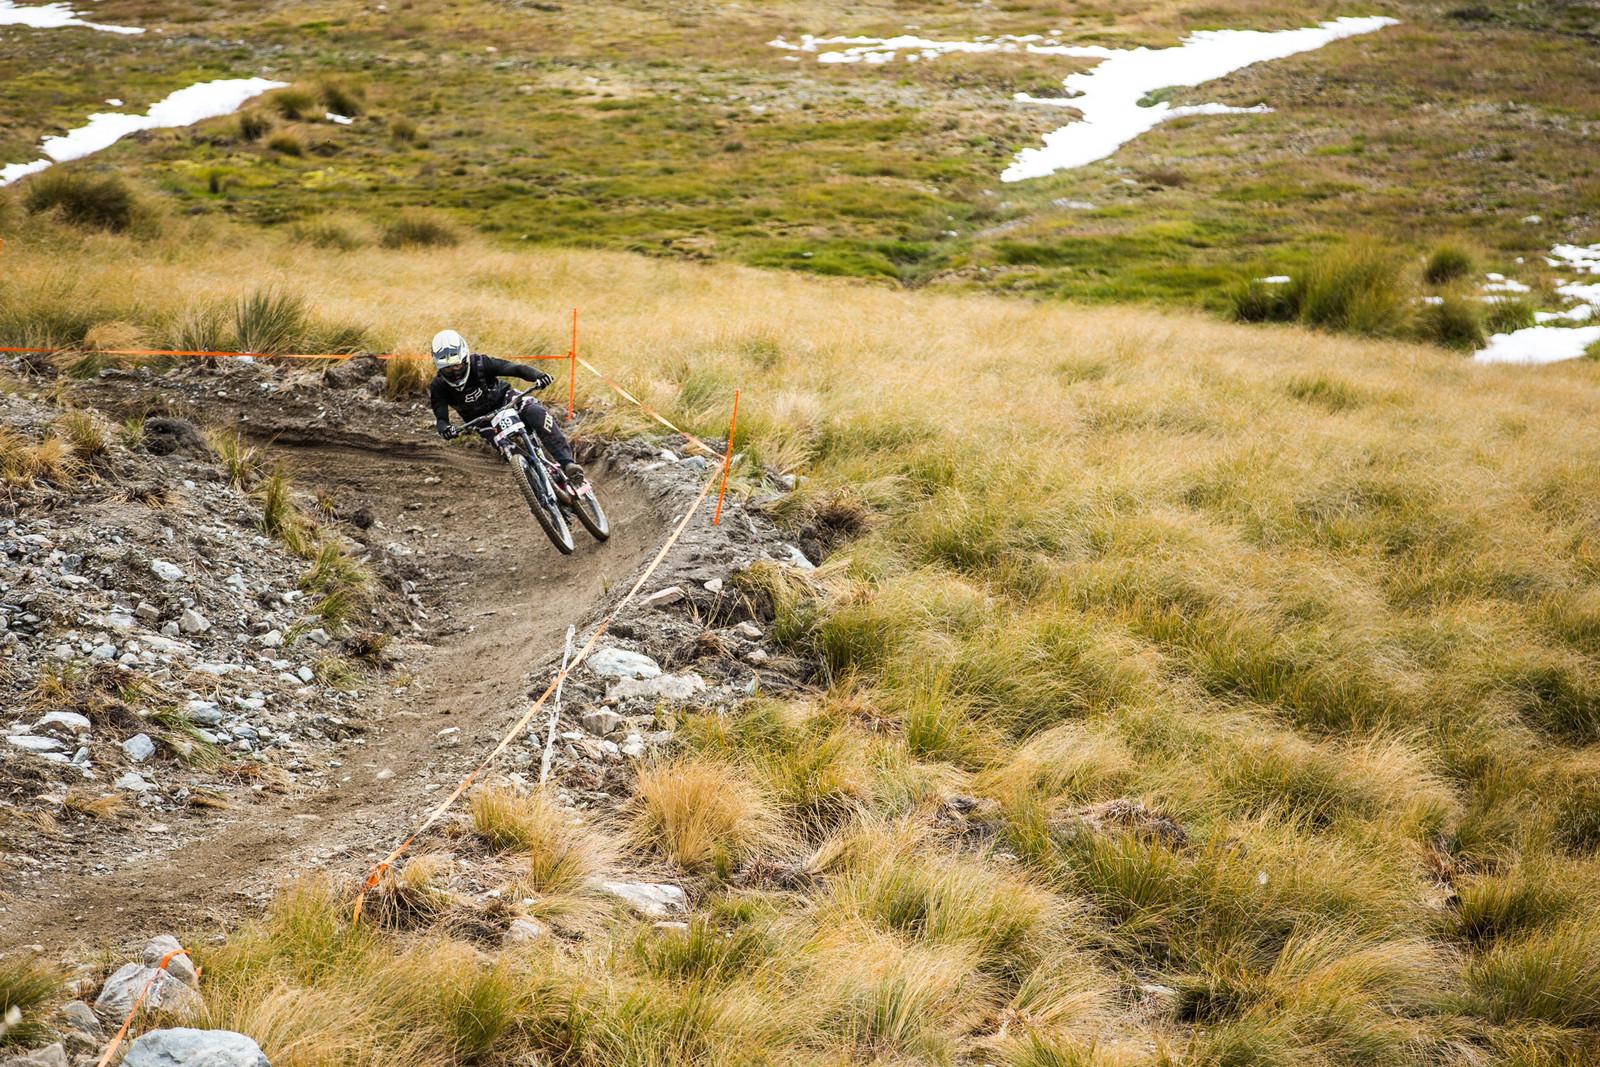 Tanguy Boucherot - Blenki, Brook & More - 2018 NZ National Champs Day 1 - Mountain Biking Pictures - Vital MTB